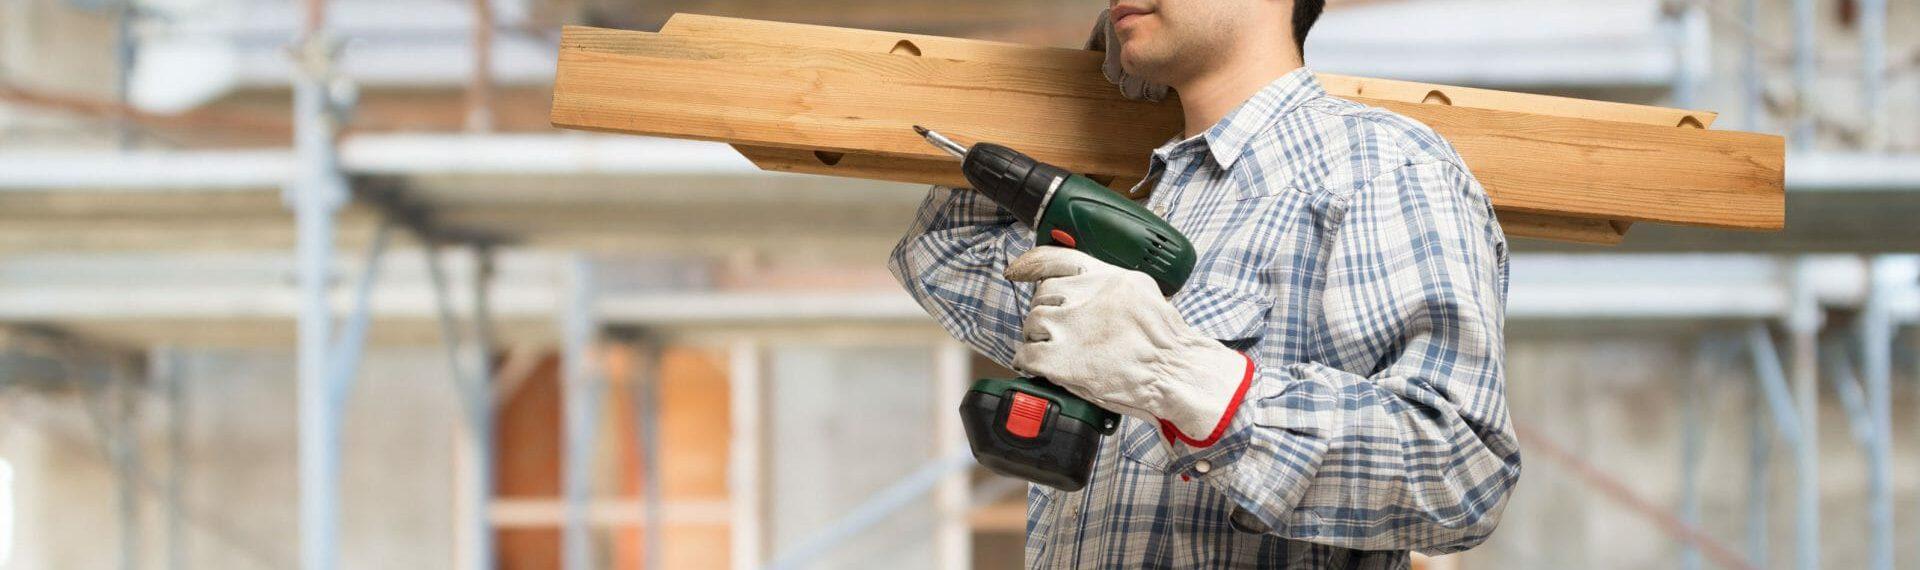 Handyman Public Liability Insurance: Explained